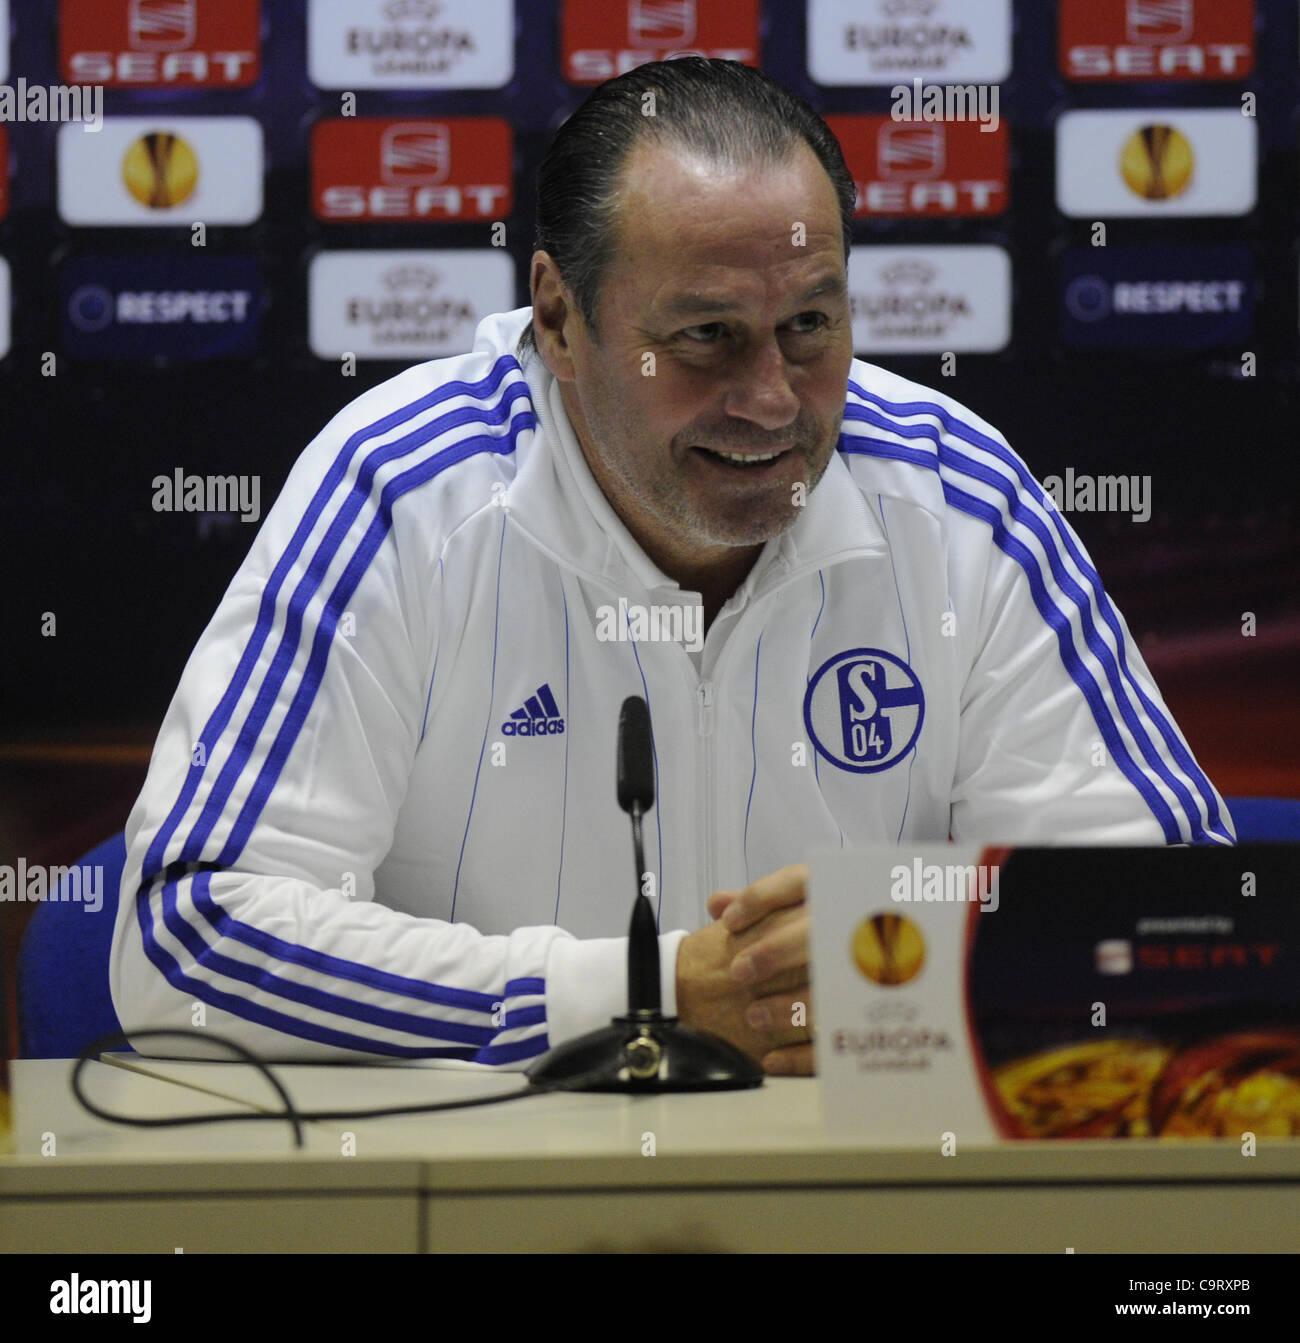 Schalke 04 coach Huub Stevens is seen during a press conference prior to the Europa League match FK Viktoria Plzen - Stock Image